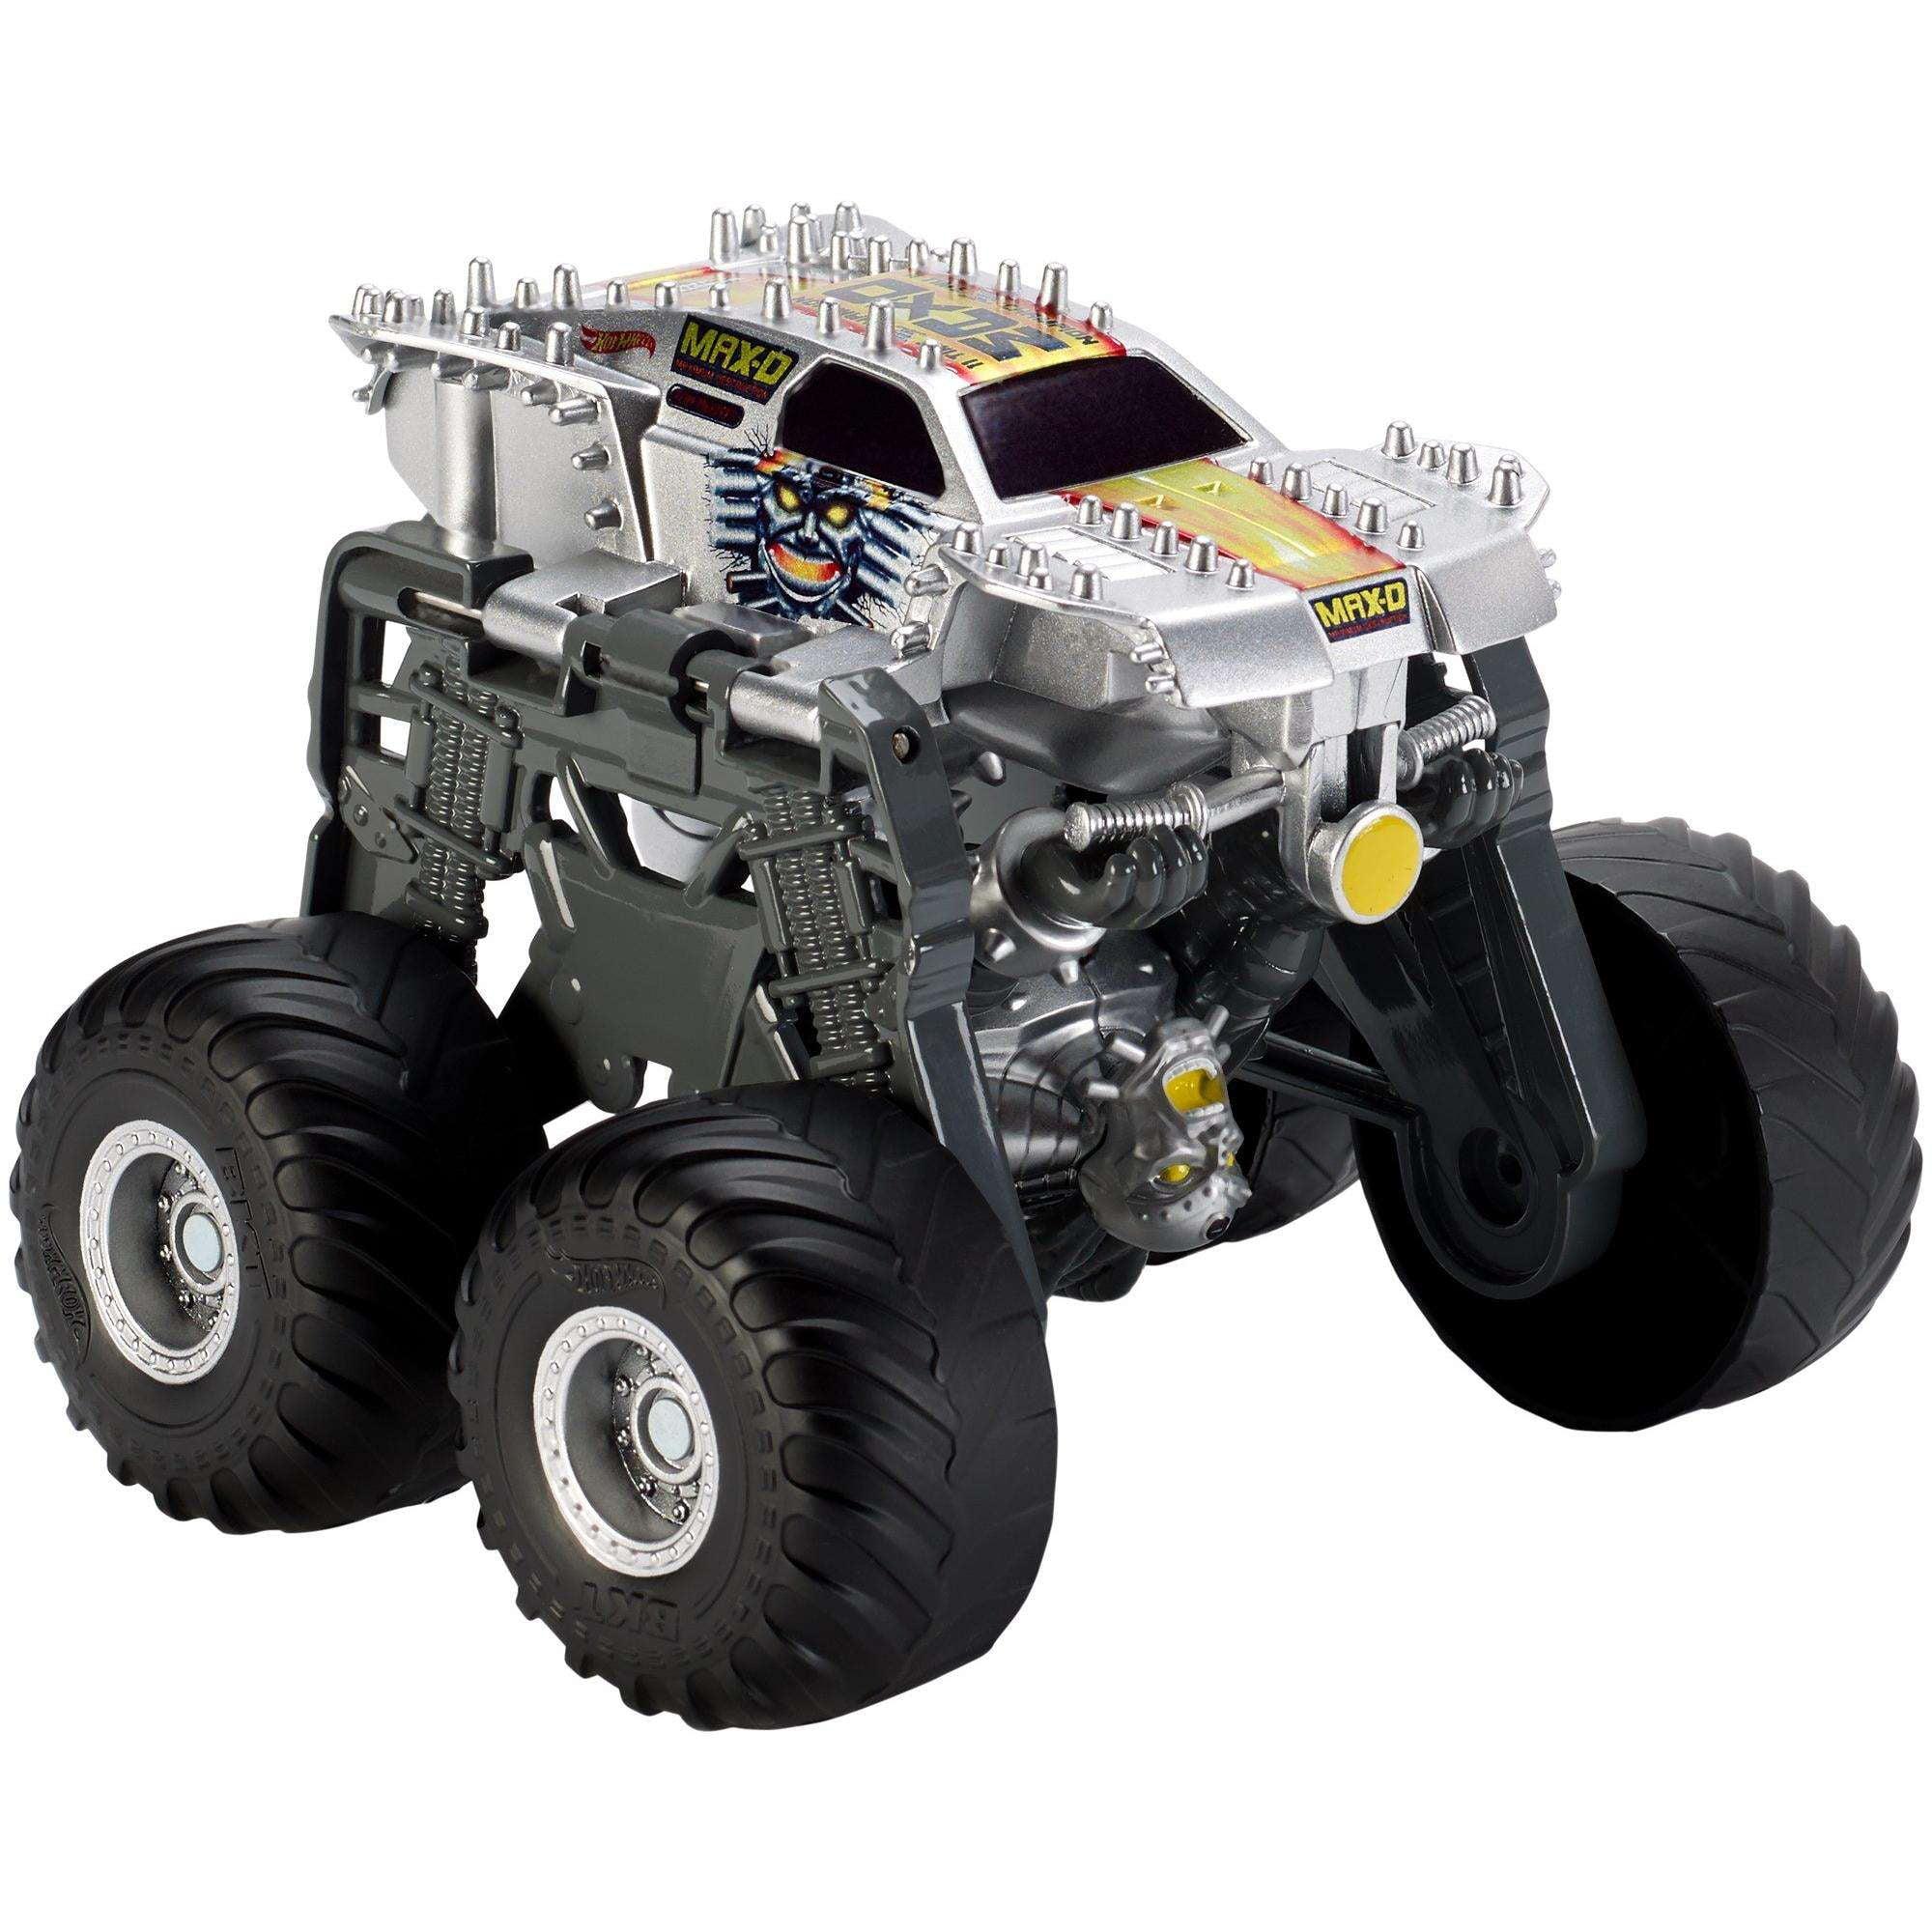 Hot Wheels Monster Jam Monster Morphers Maximum Destruction Vehicle by Mattel